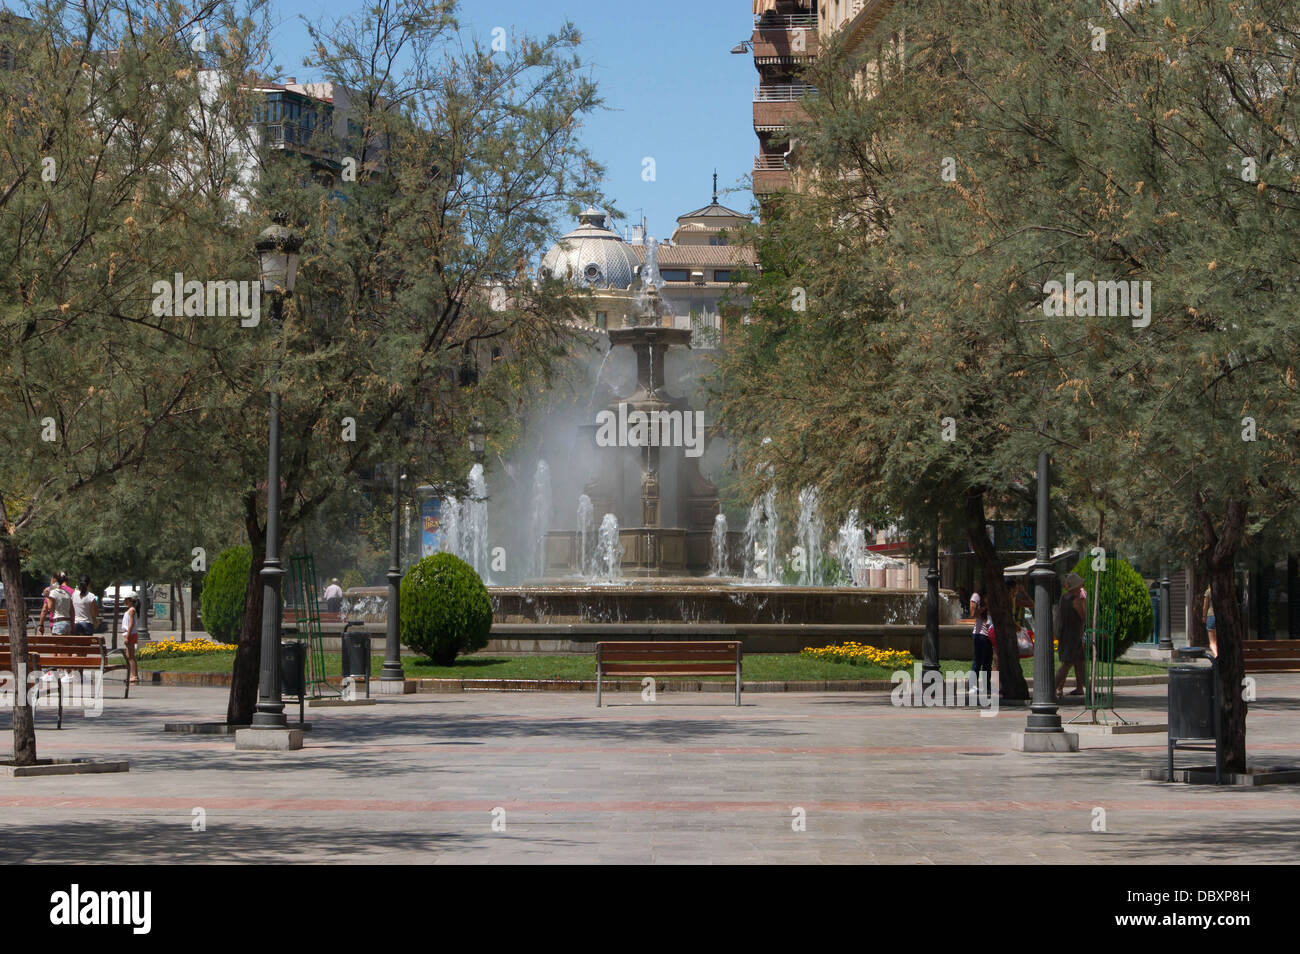 View of the Fountain of the Battles (Fuente de la Batallas), in Granada, Spain. - Stock Image